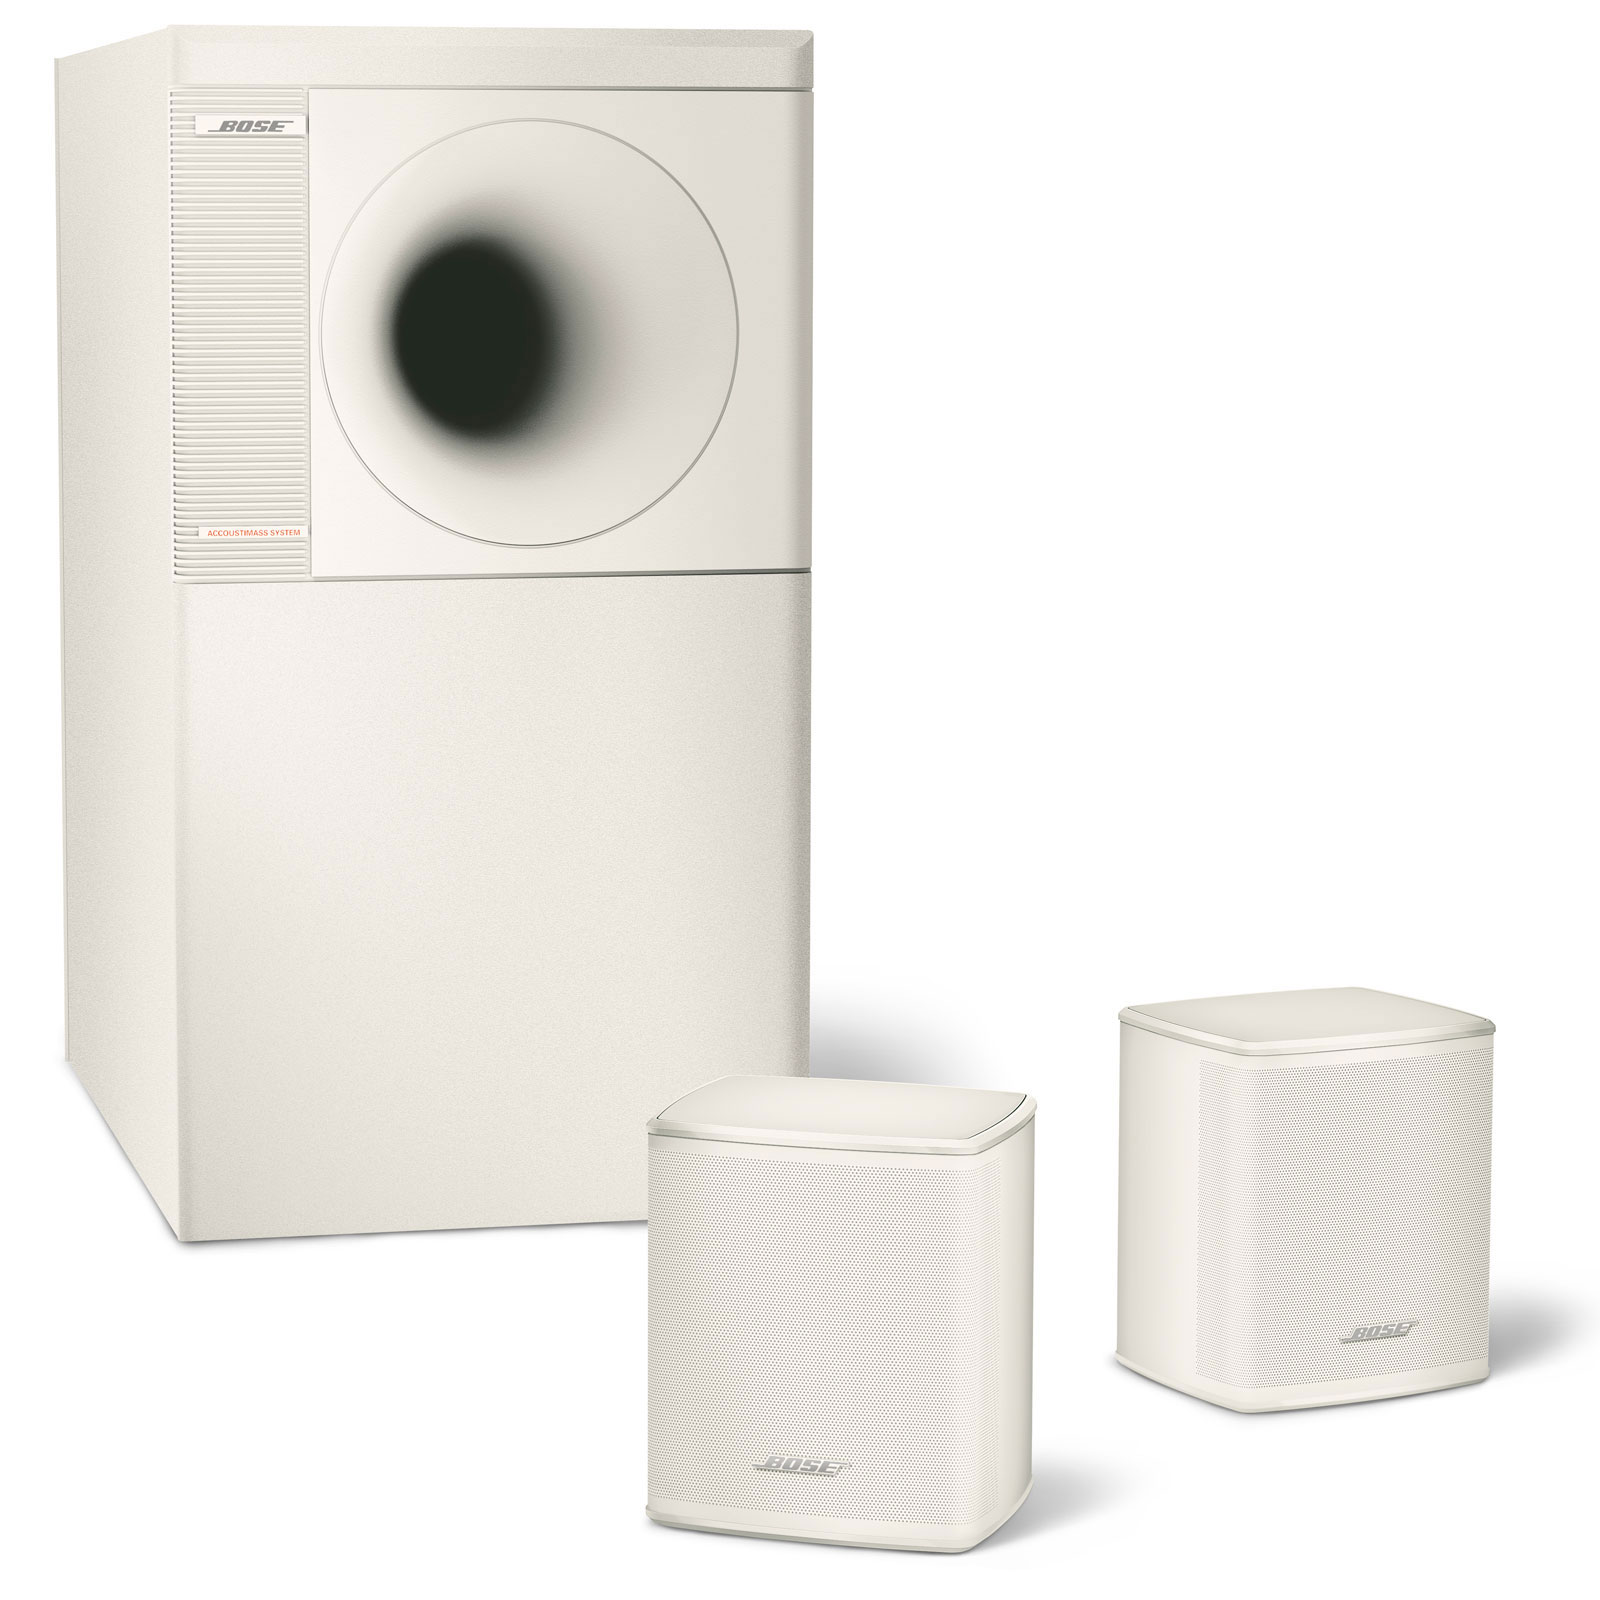 denon ceol n9 blanc bose acoustimass 3 series v blanc. Black Bedroom Furniture Sets. Home Design Ideas